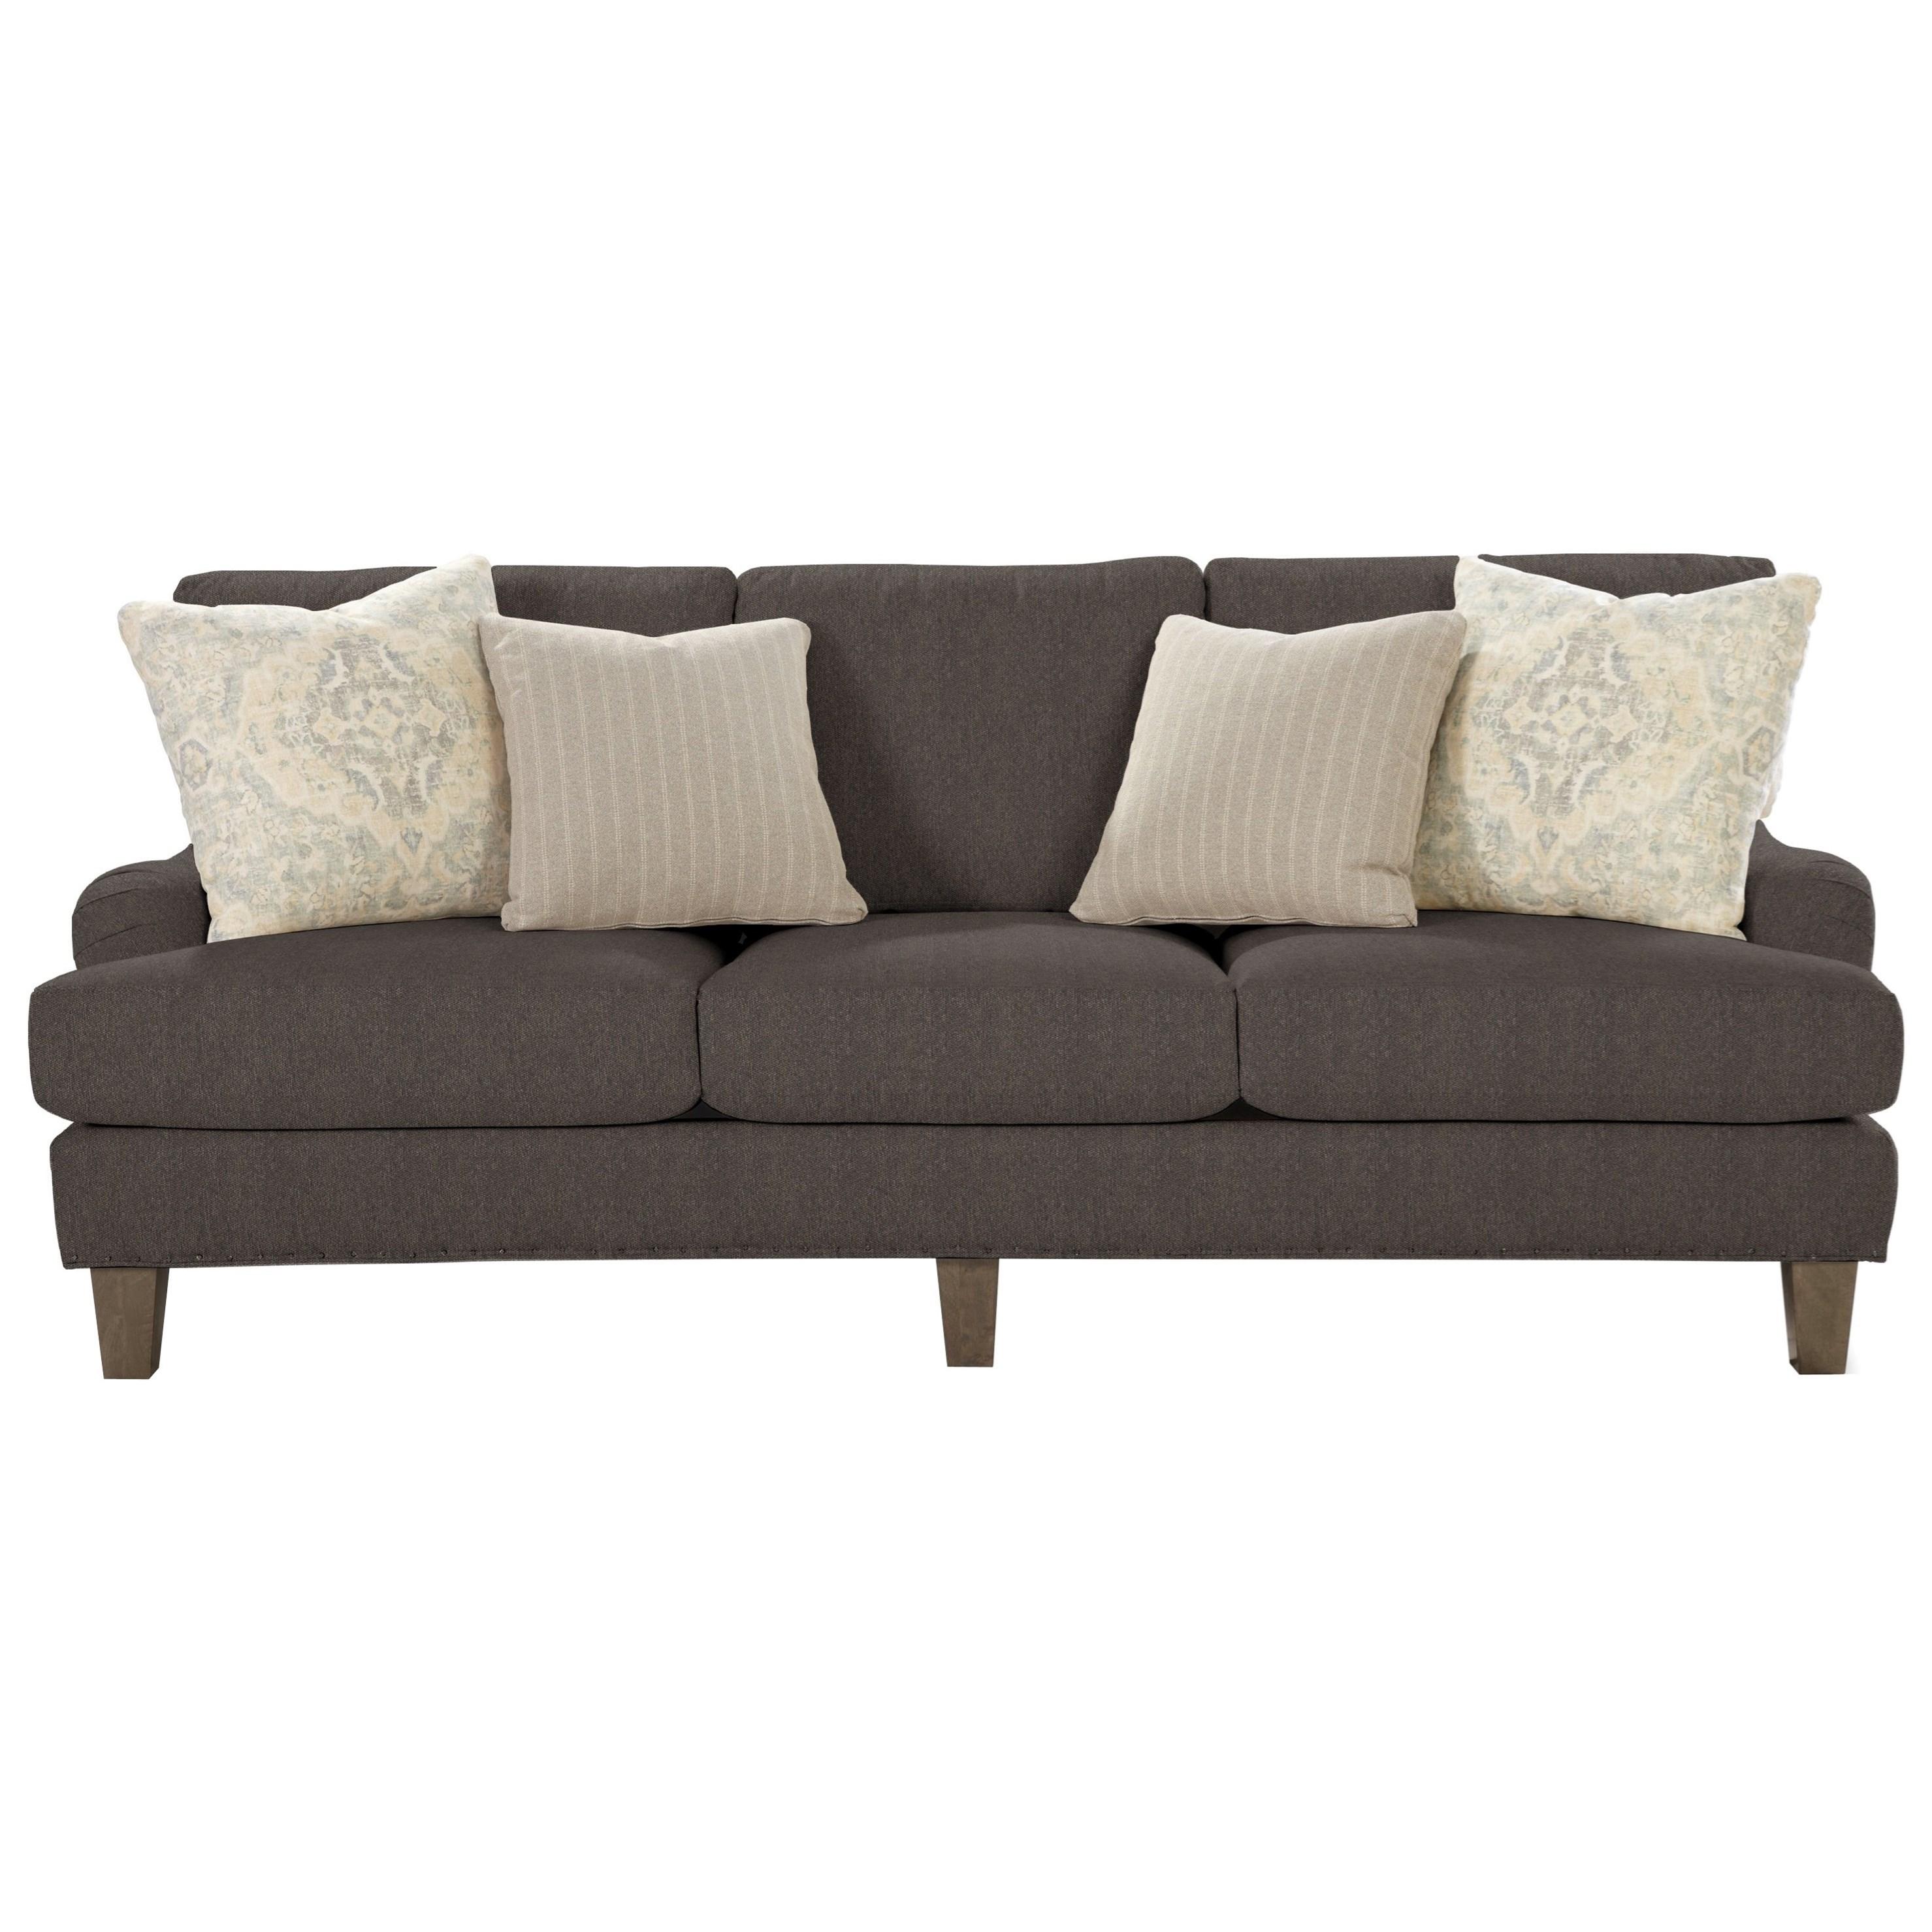 Transitional English-Arm Sofa with Vintage Tack Trim